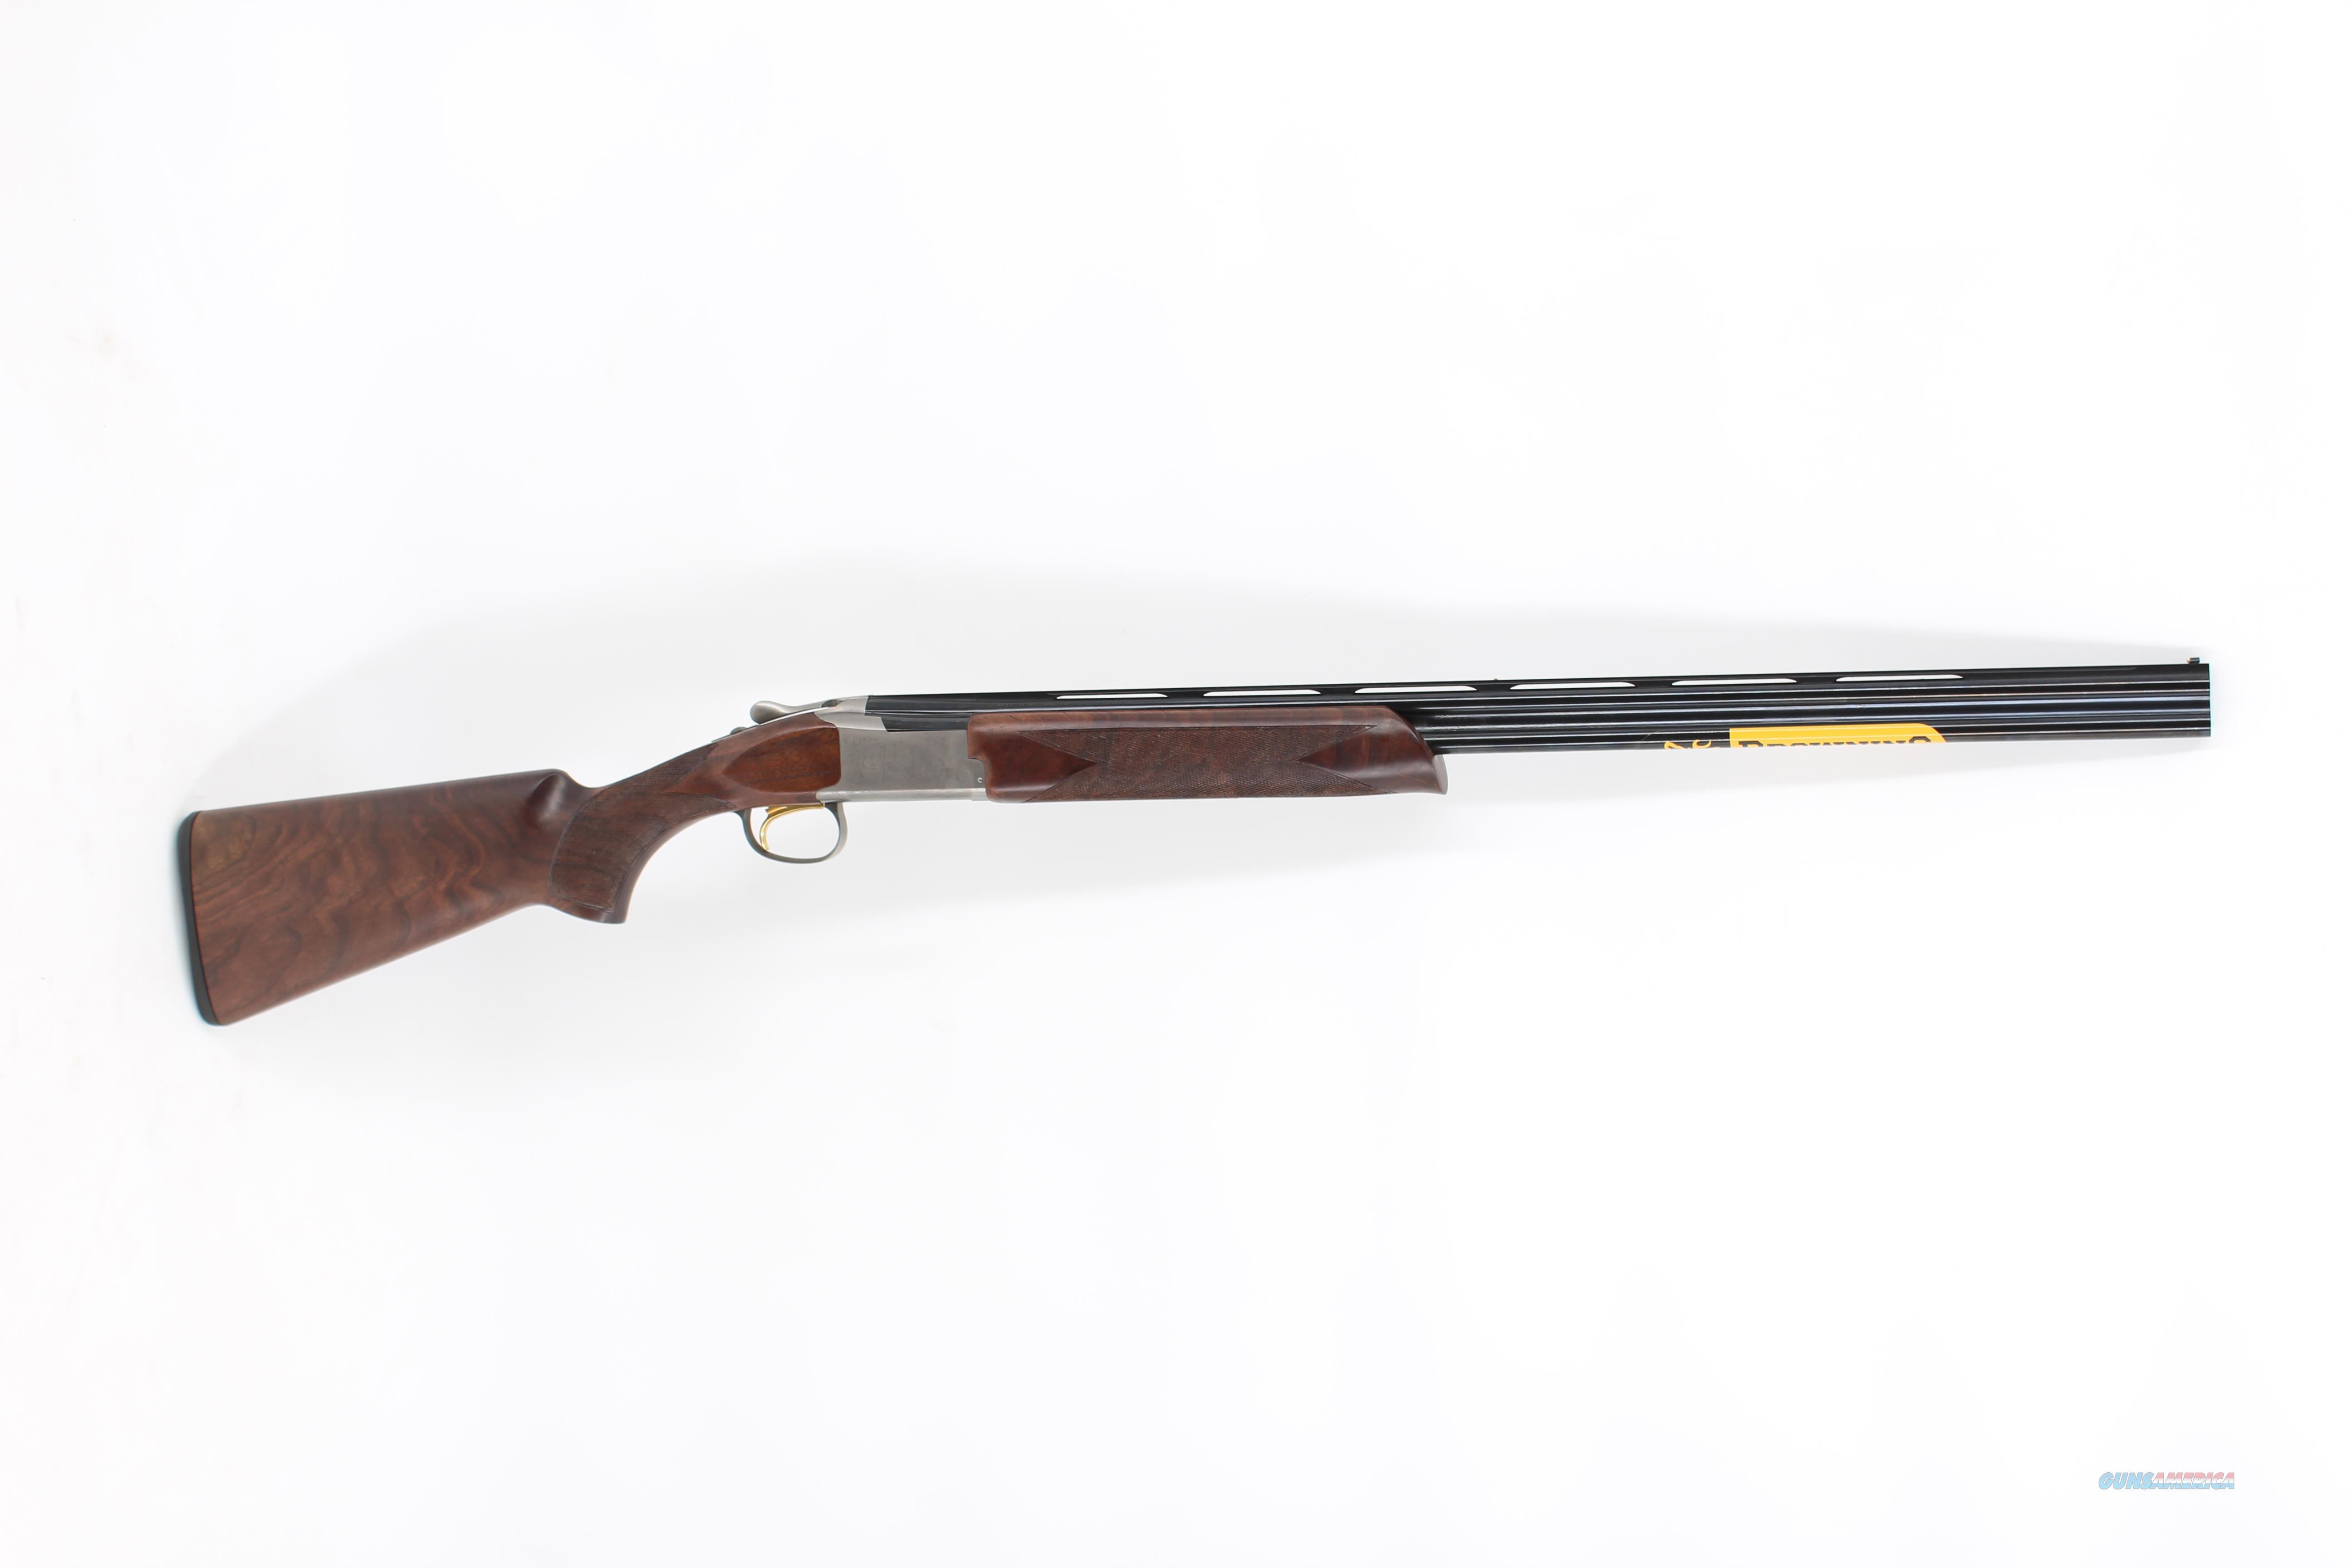 Browning Citori 725 Field 410/28  Guns > Shotguns > Browning Shotguns > Over Unders > Citori > Hunting